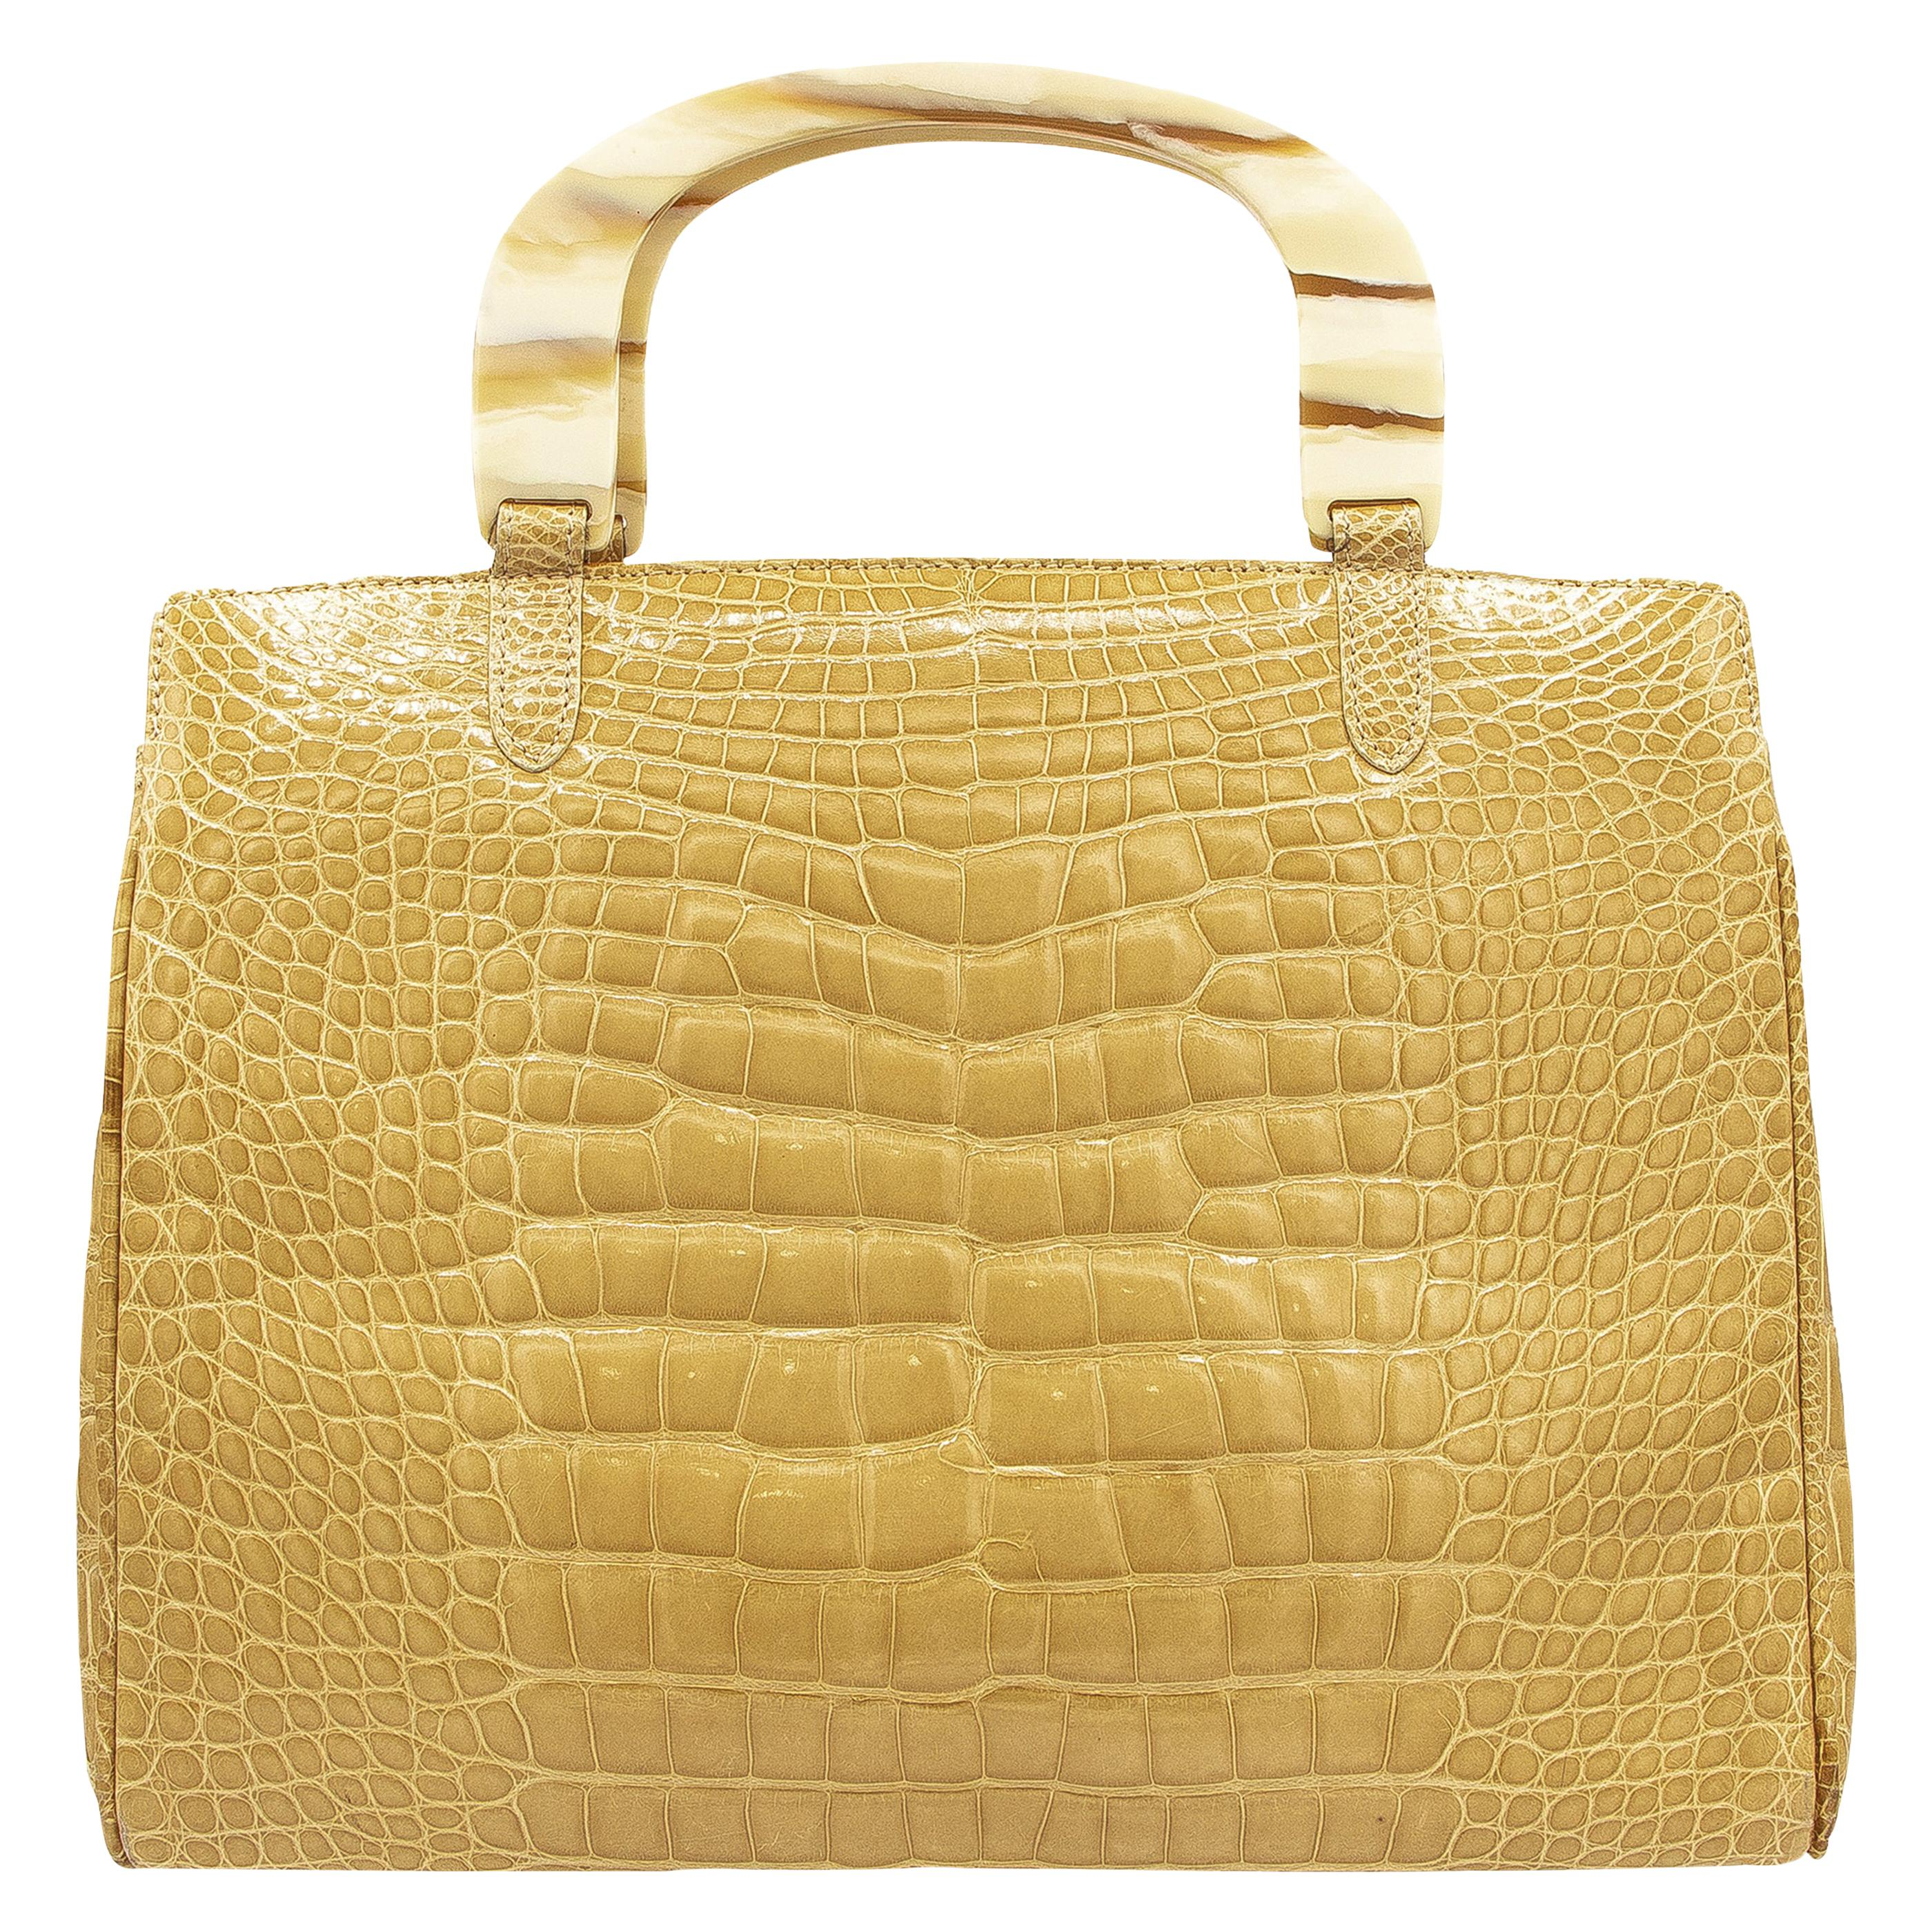 Lana Marks Tan Crocodile Handbag